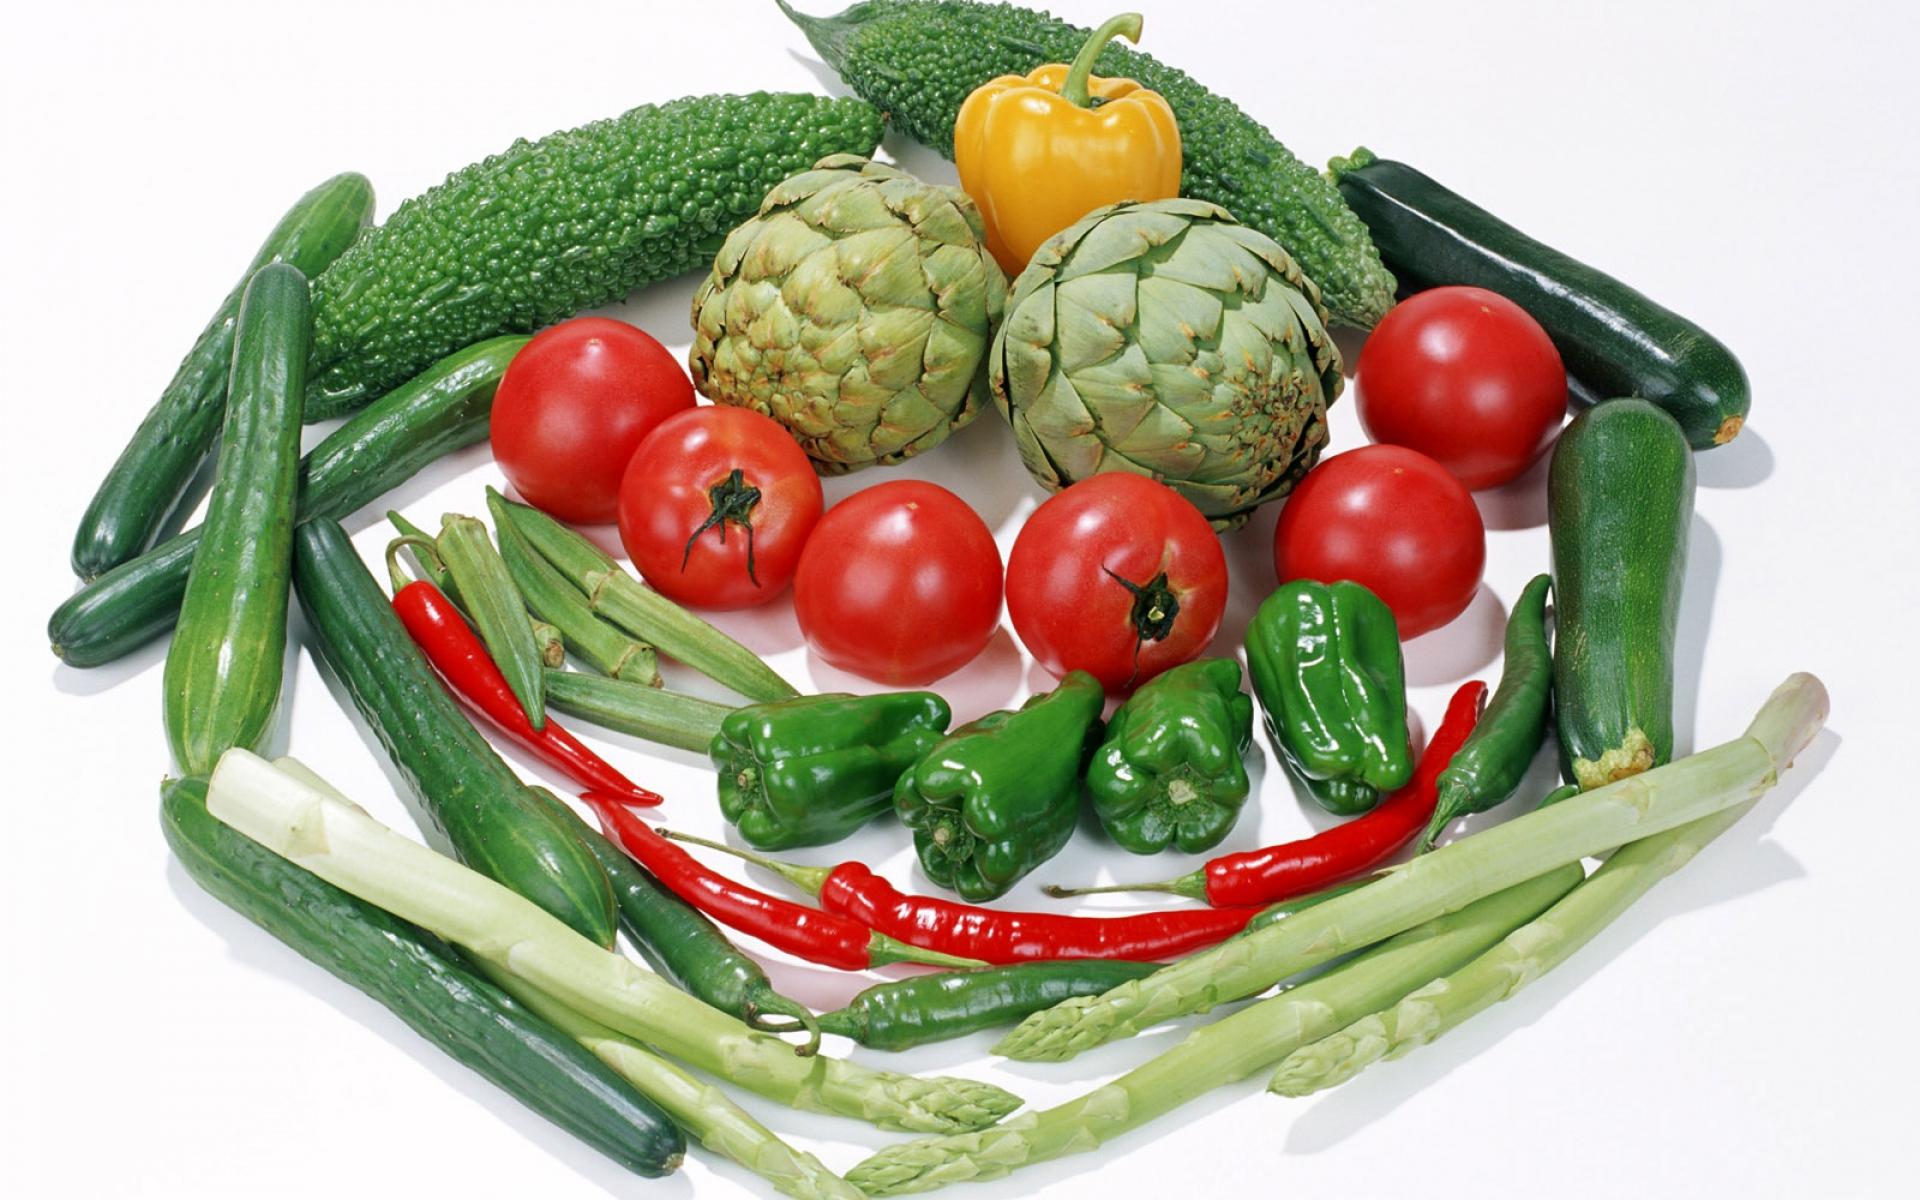 Картинки Овощи, перец, огурцы, помидоры, ассорти фото и обои на рабочий стол